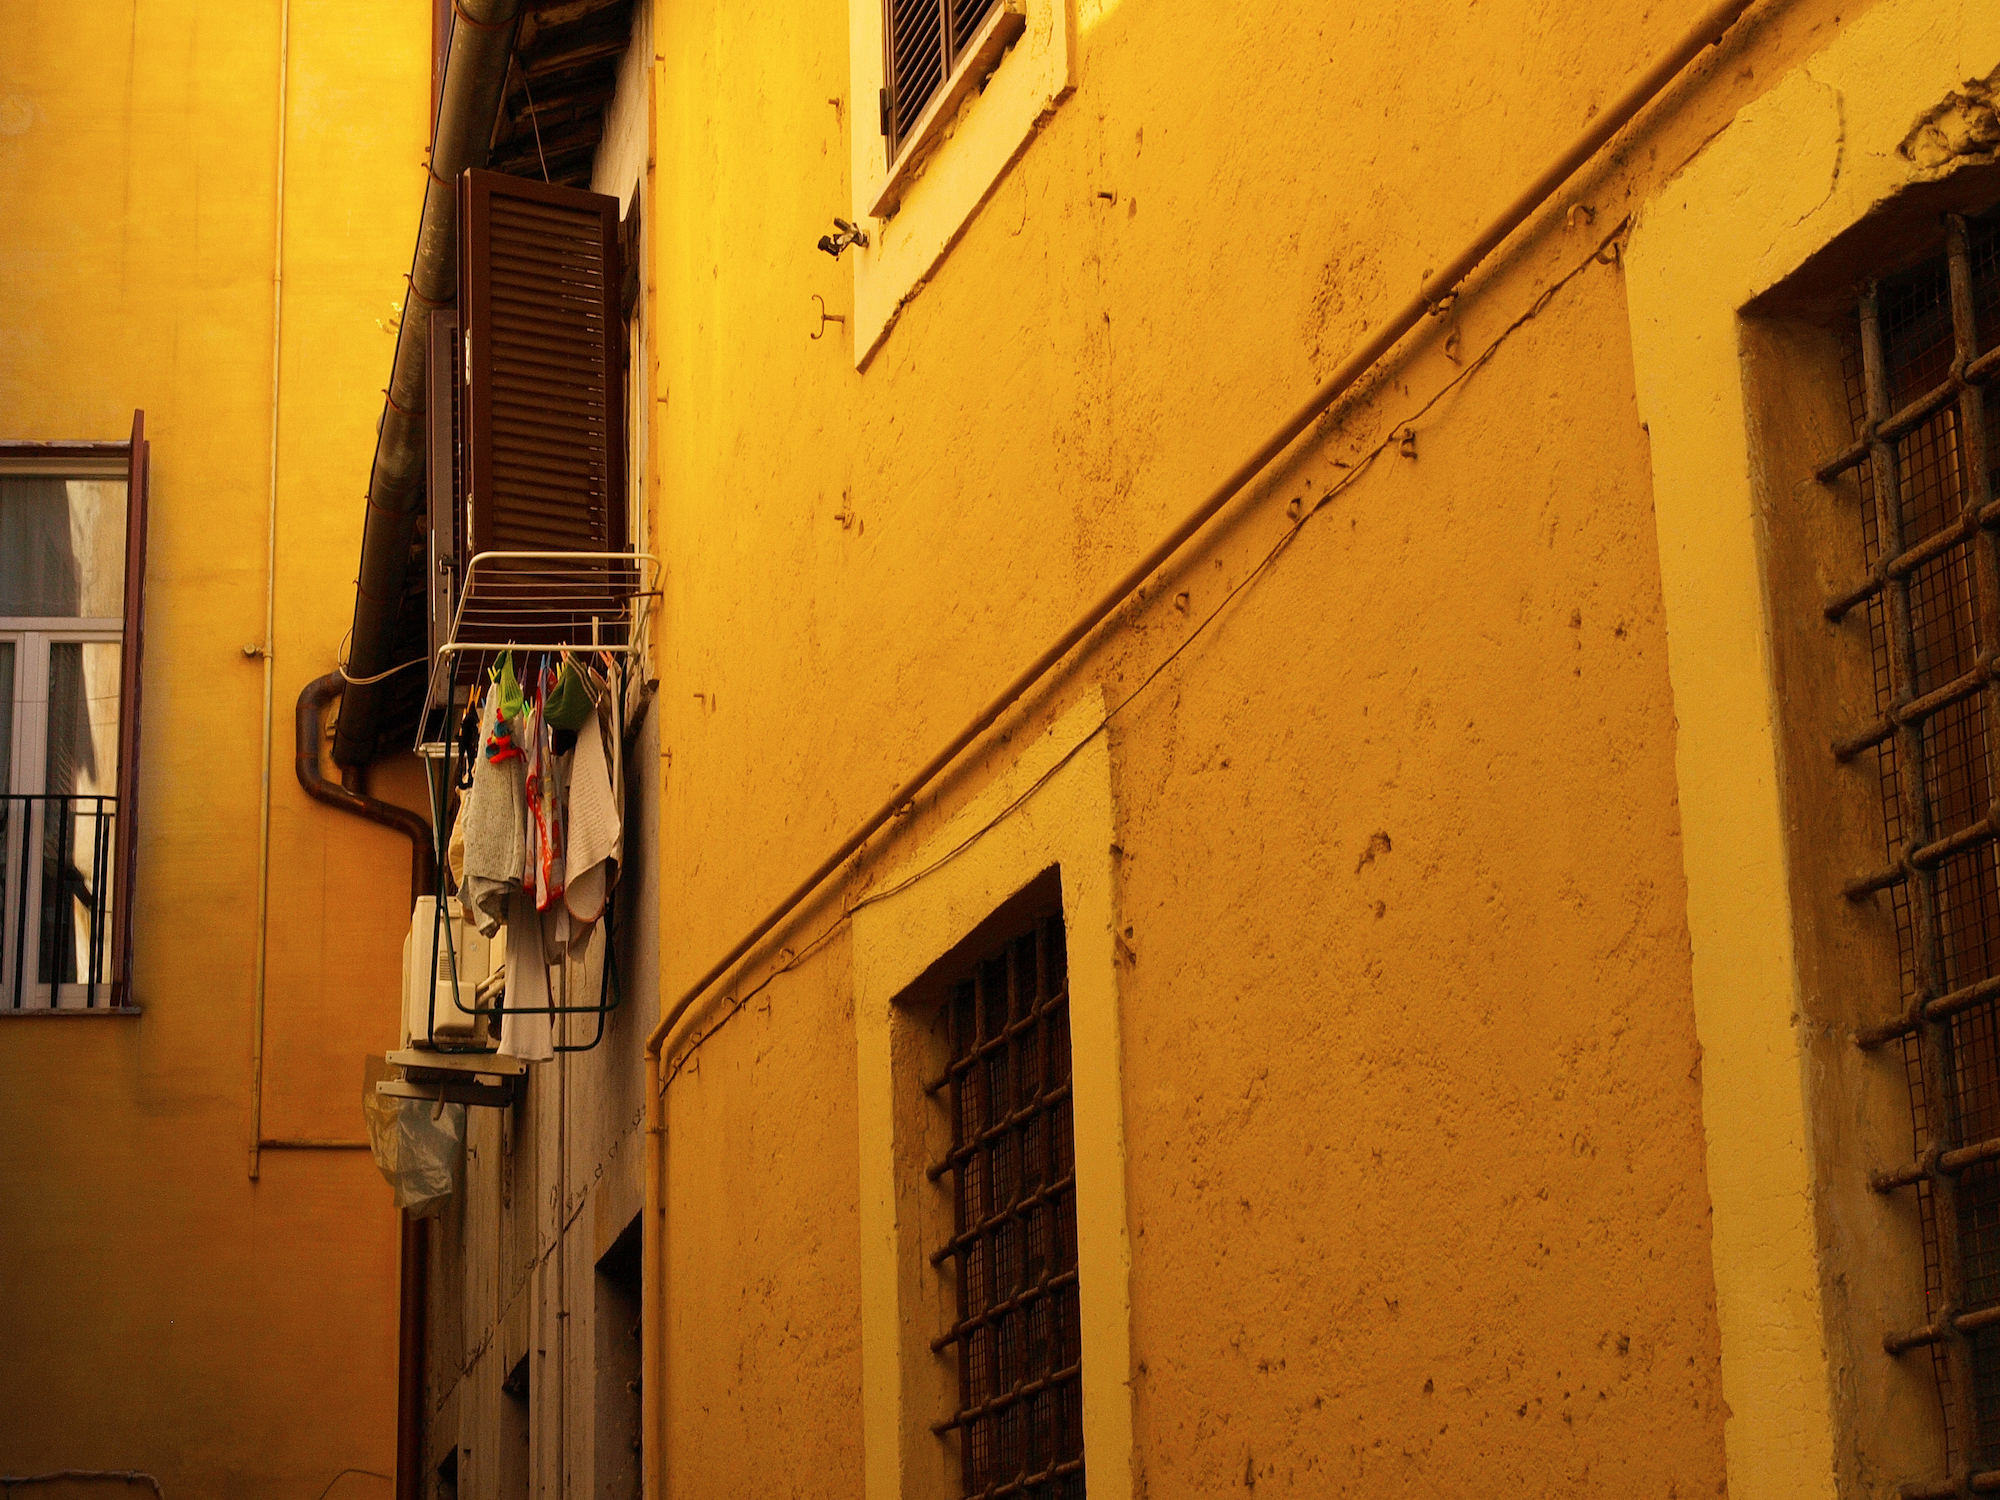 Alley 01  / Part of 'Trip To Italy' series by Geena Matuson @geenamatuson, 2011.